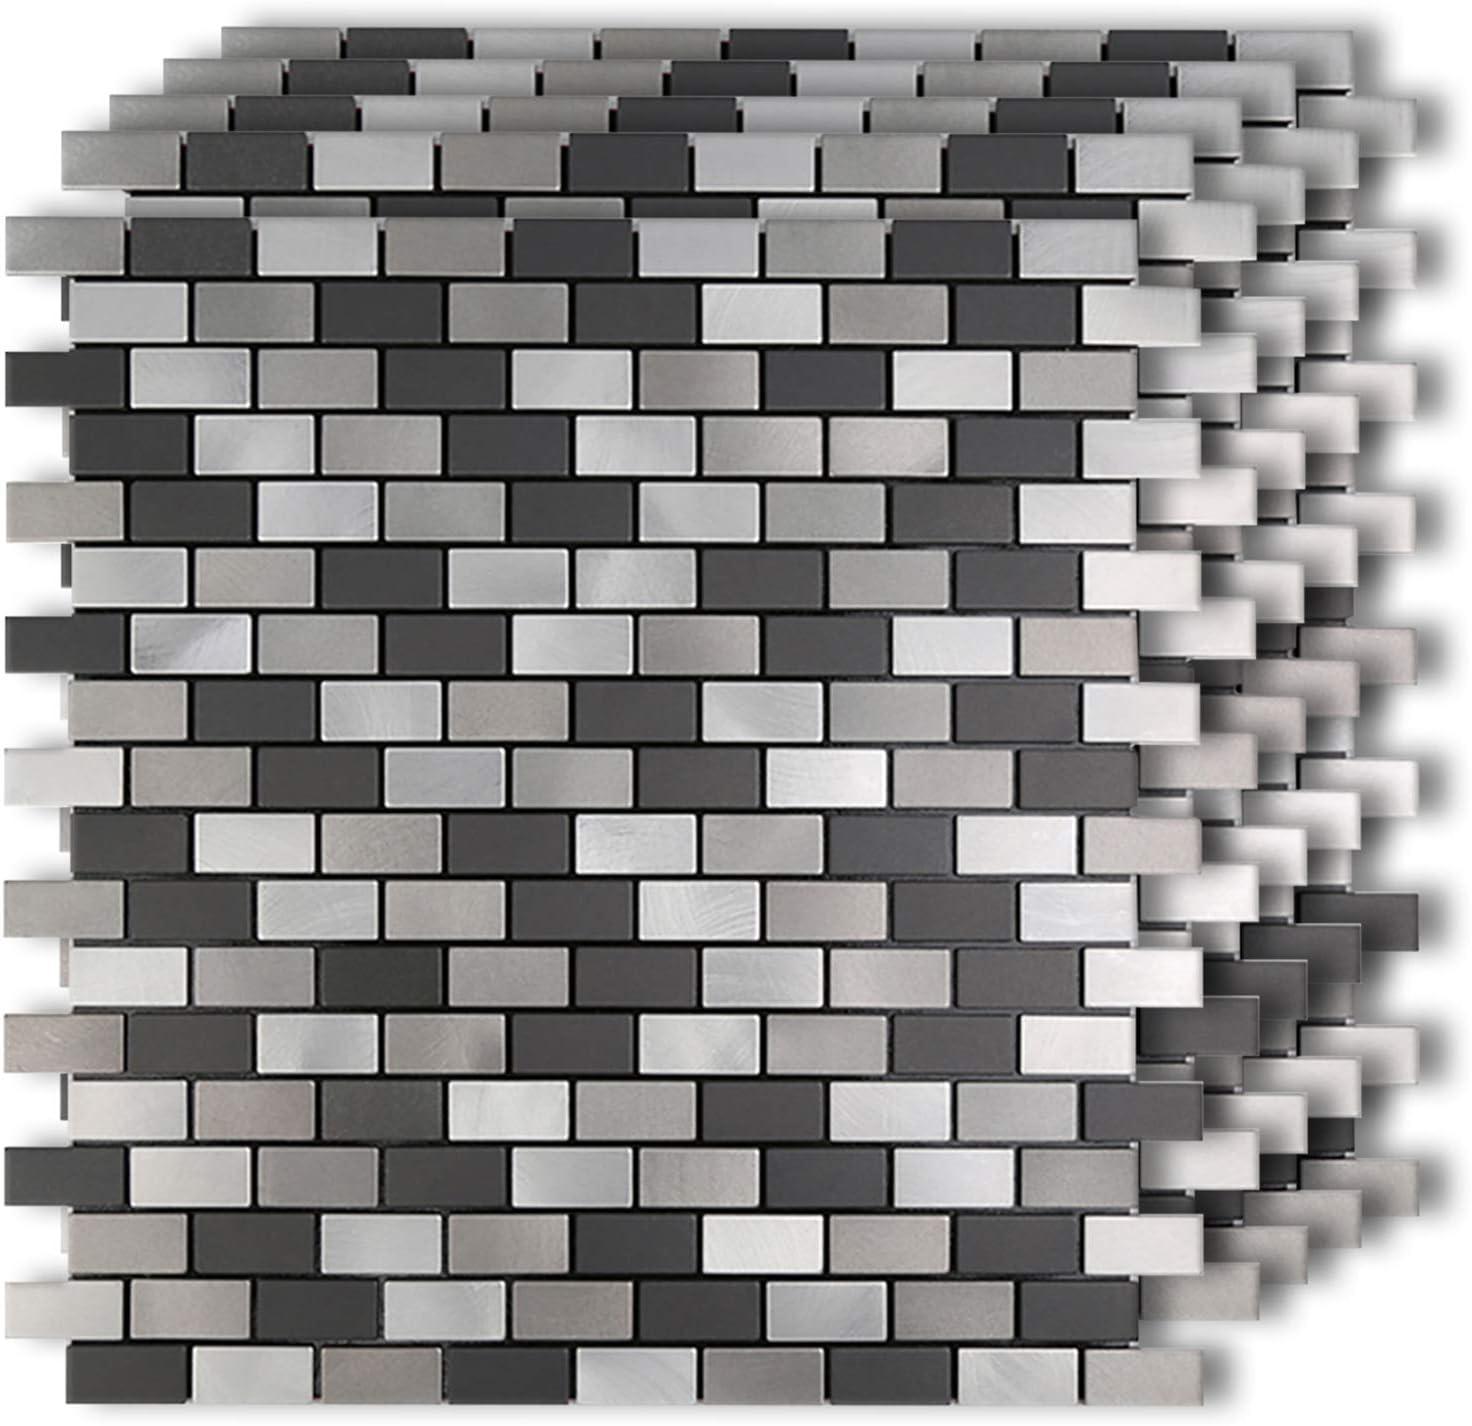 "HomeyMosaic Black&Grey Subway Stripe Peel and Stick Tile Metal Backsplash for Kitchen Bathroom Stove Walls Self-Adhesive Aluminum Surface Metal Smart Tiles 3D Wall Sticker(12""x12""x 5 Sheets)"